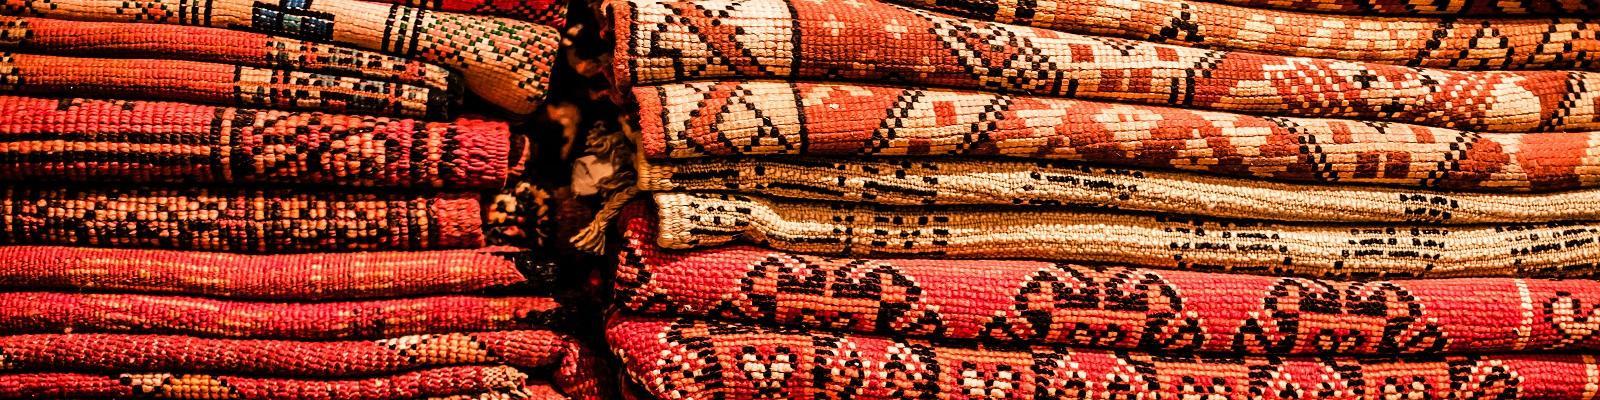 Berber rugs line a street in Marrakech's medina. Photo: streetflash / Shutterstock